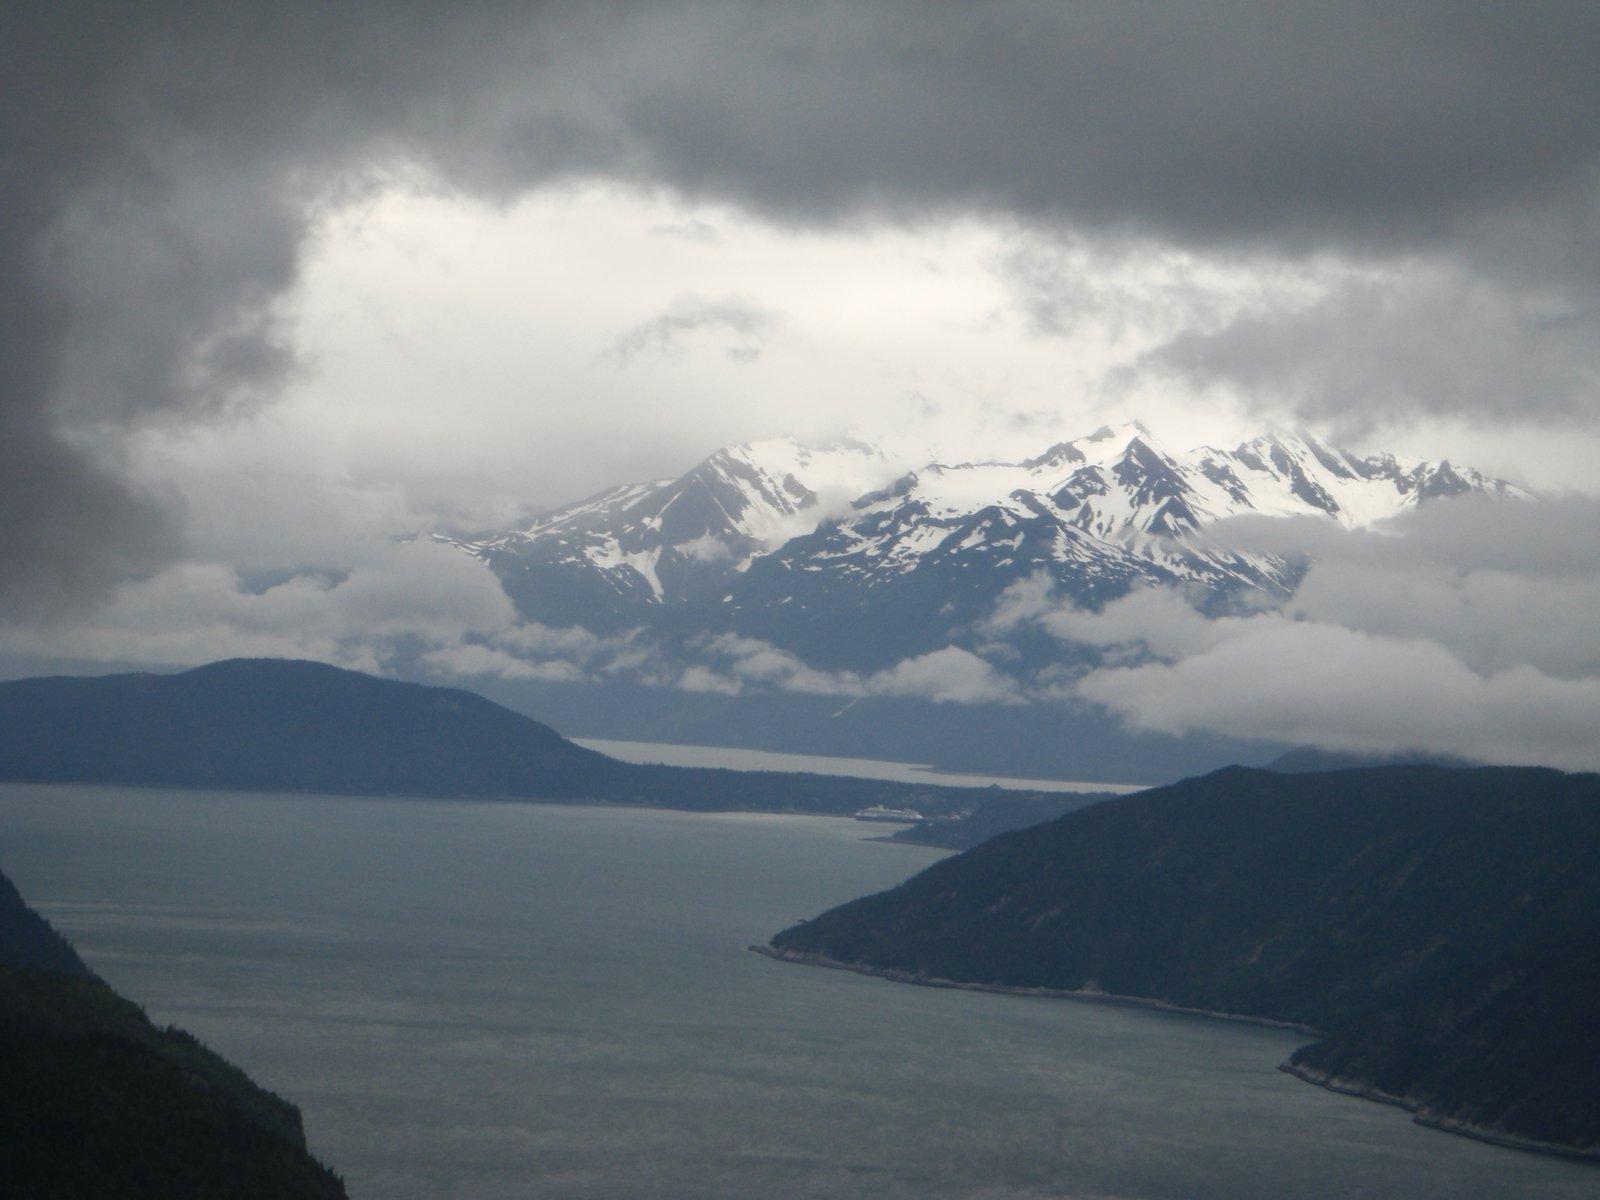 Alaska from a Heli